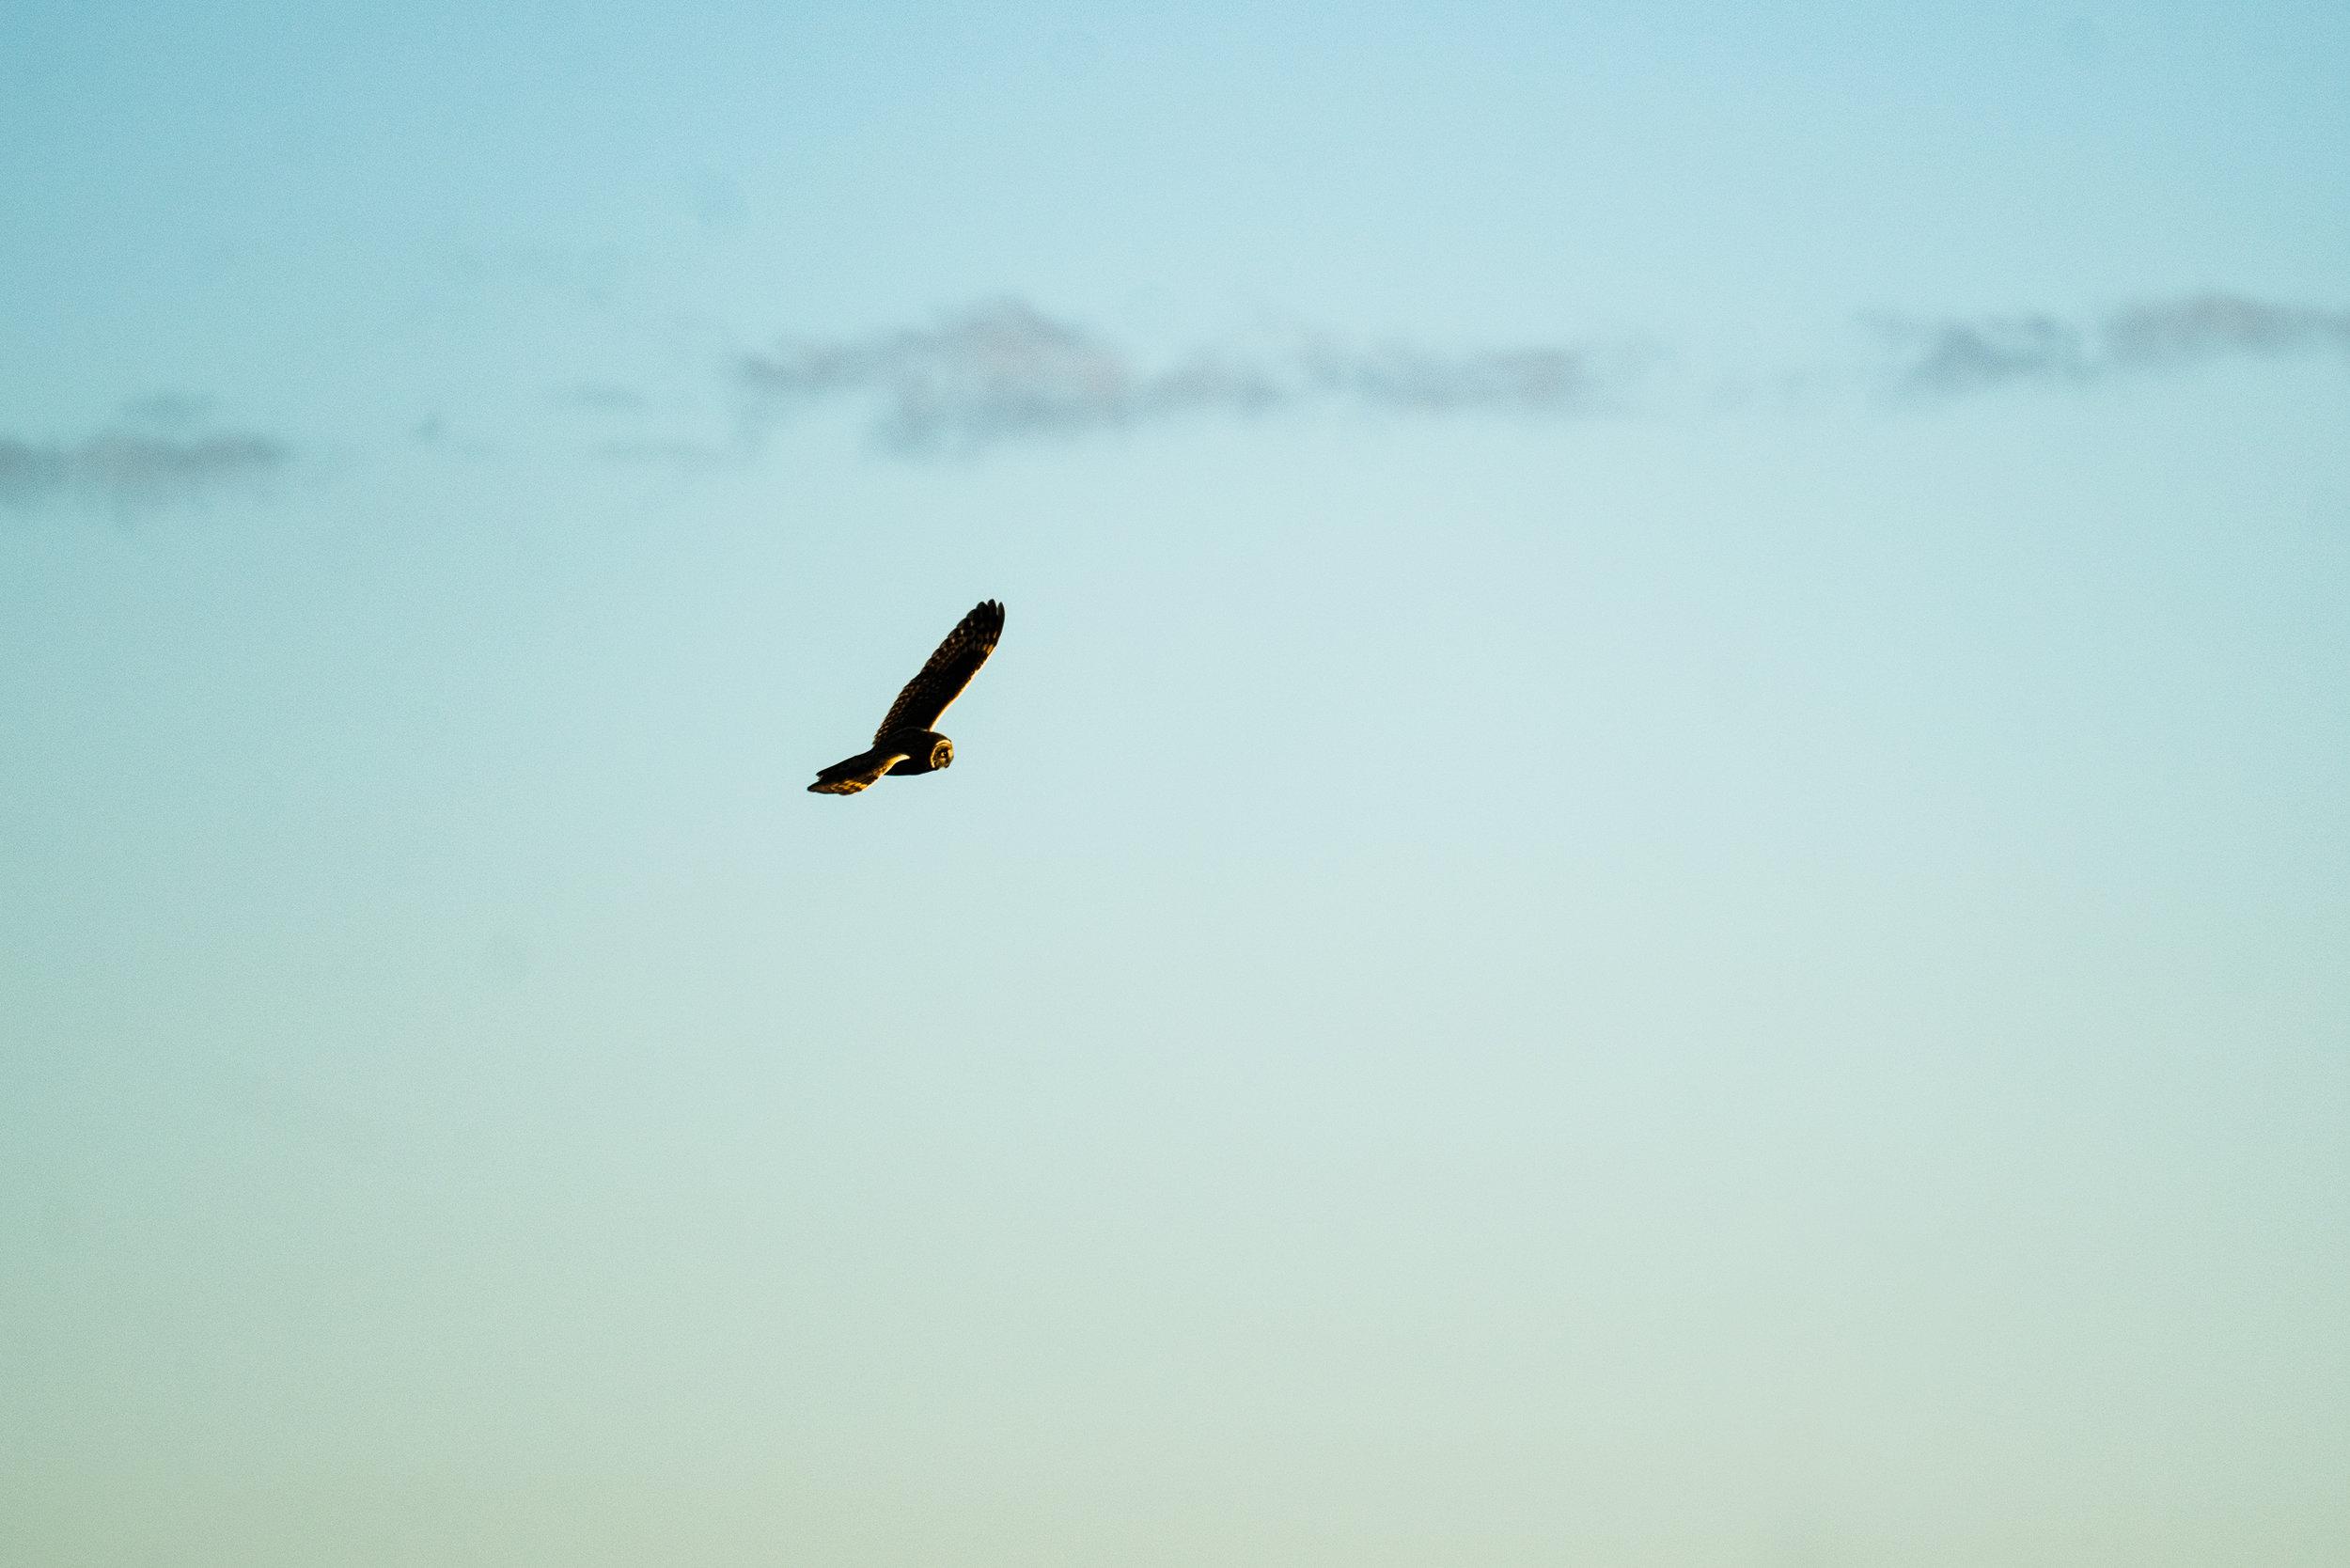 Seattle, Washington Wildlife Photograph of a Short-Eared Owl